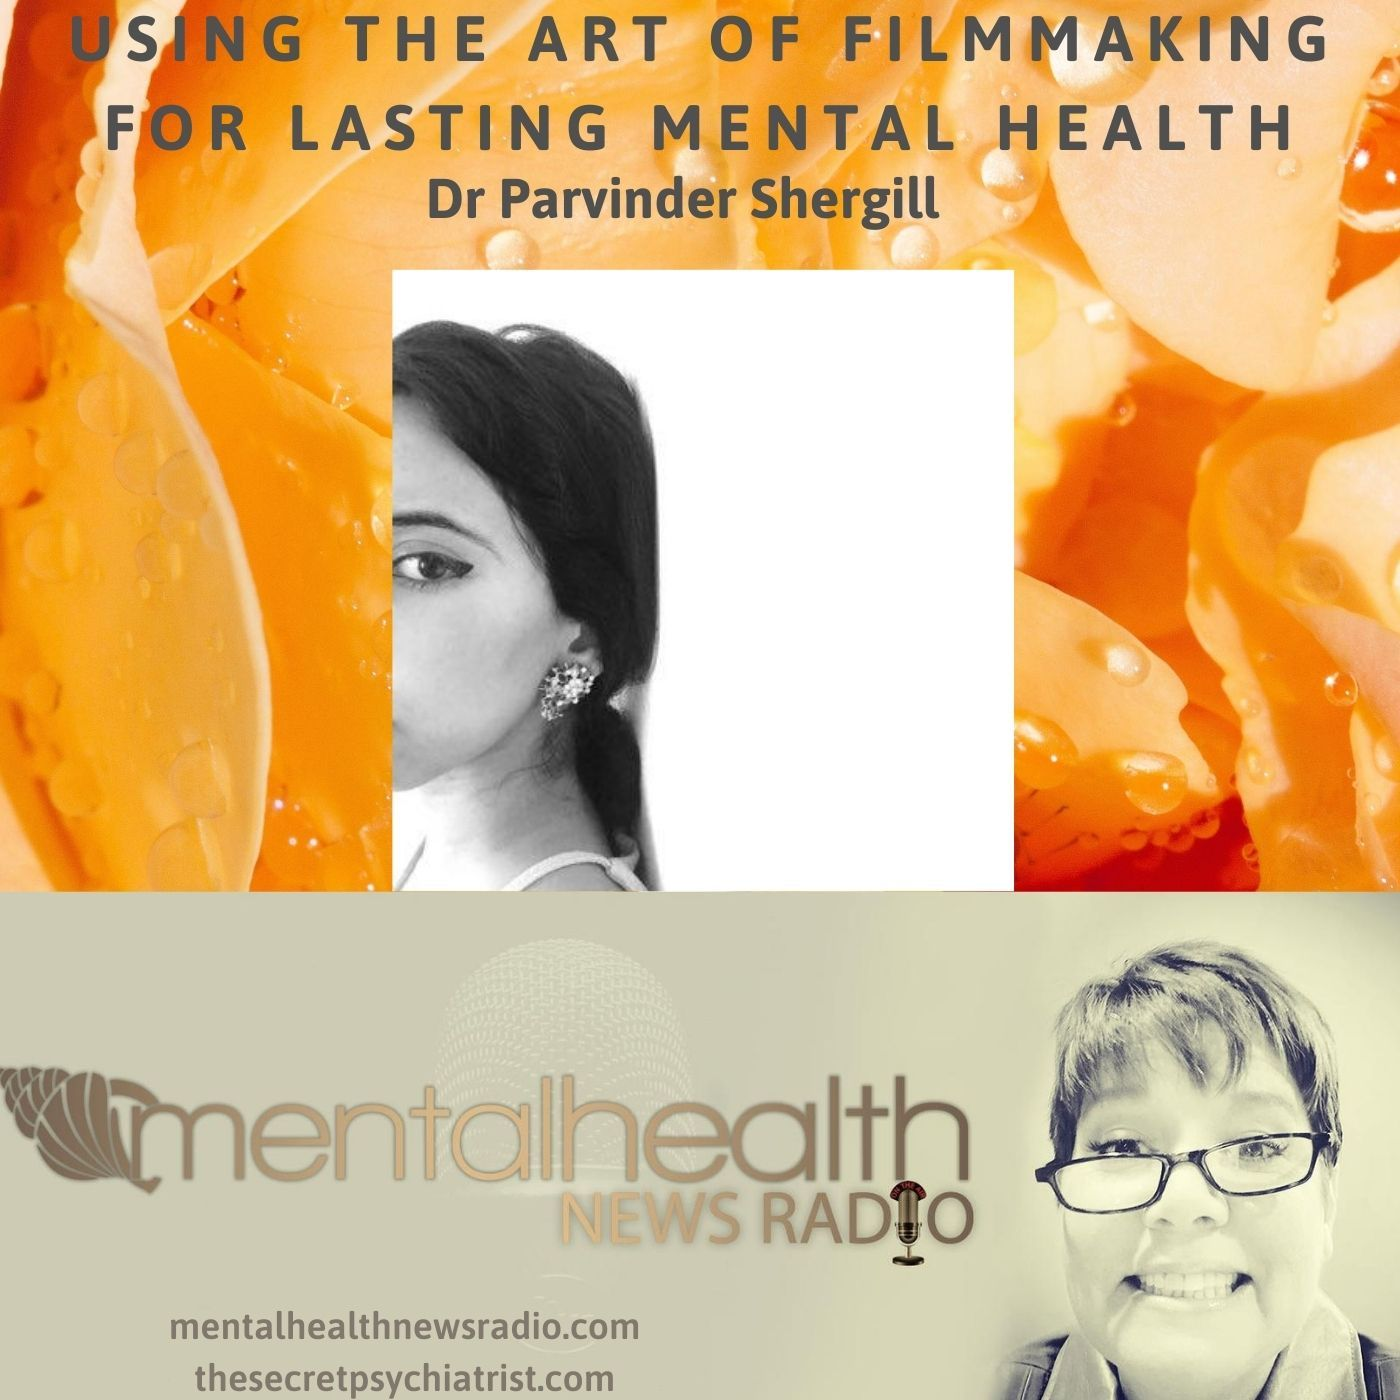 Mental Health News Radio - Using the Art of Filmmaking for Lasting Mental Health